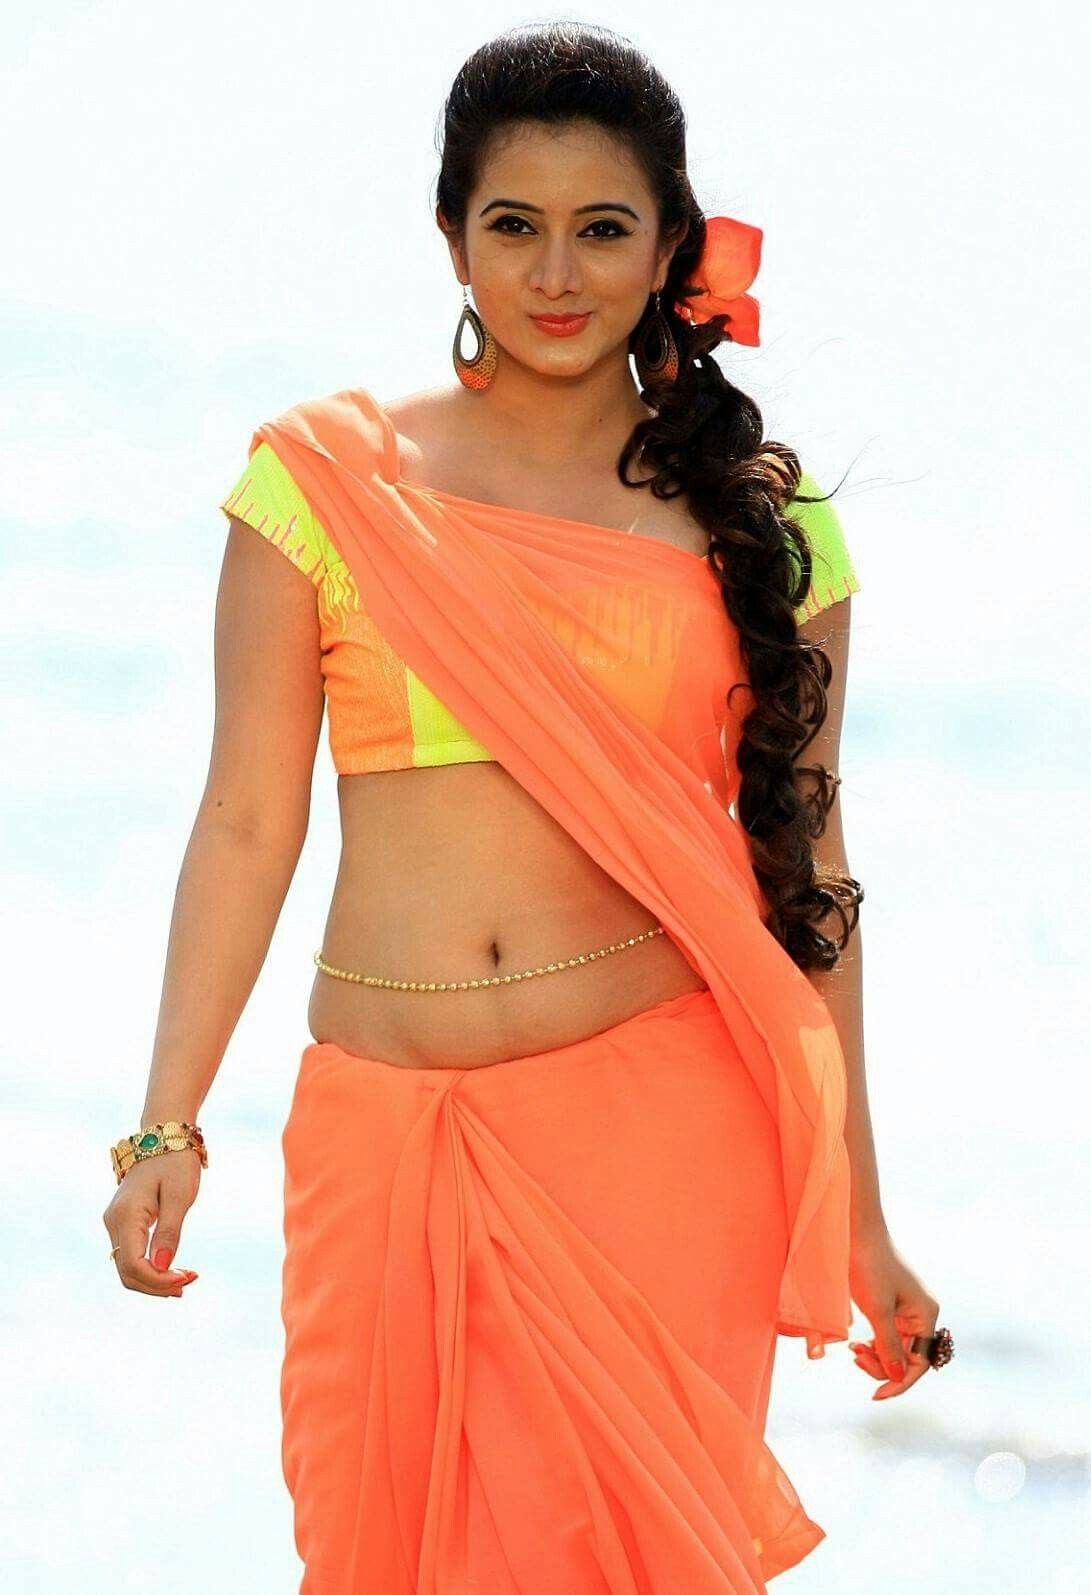 Pin by prash on indian pinterest saree actresses and girls